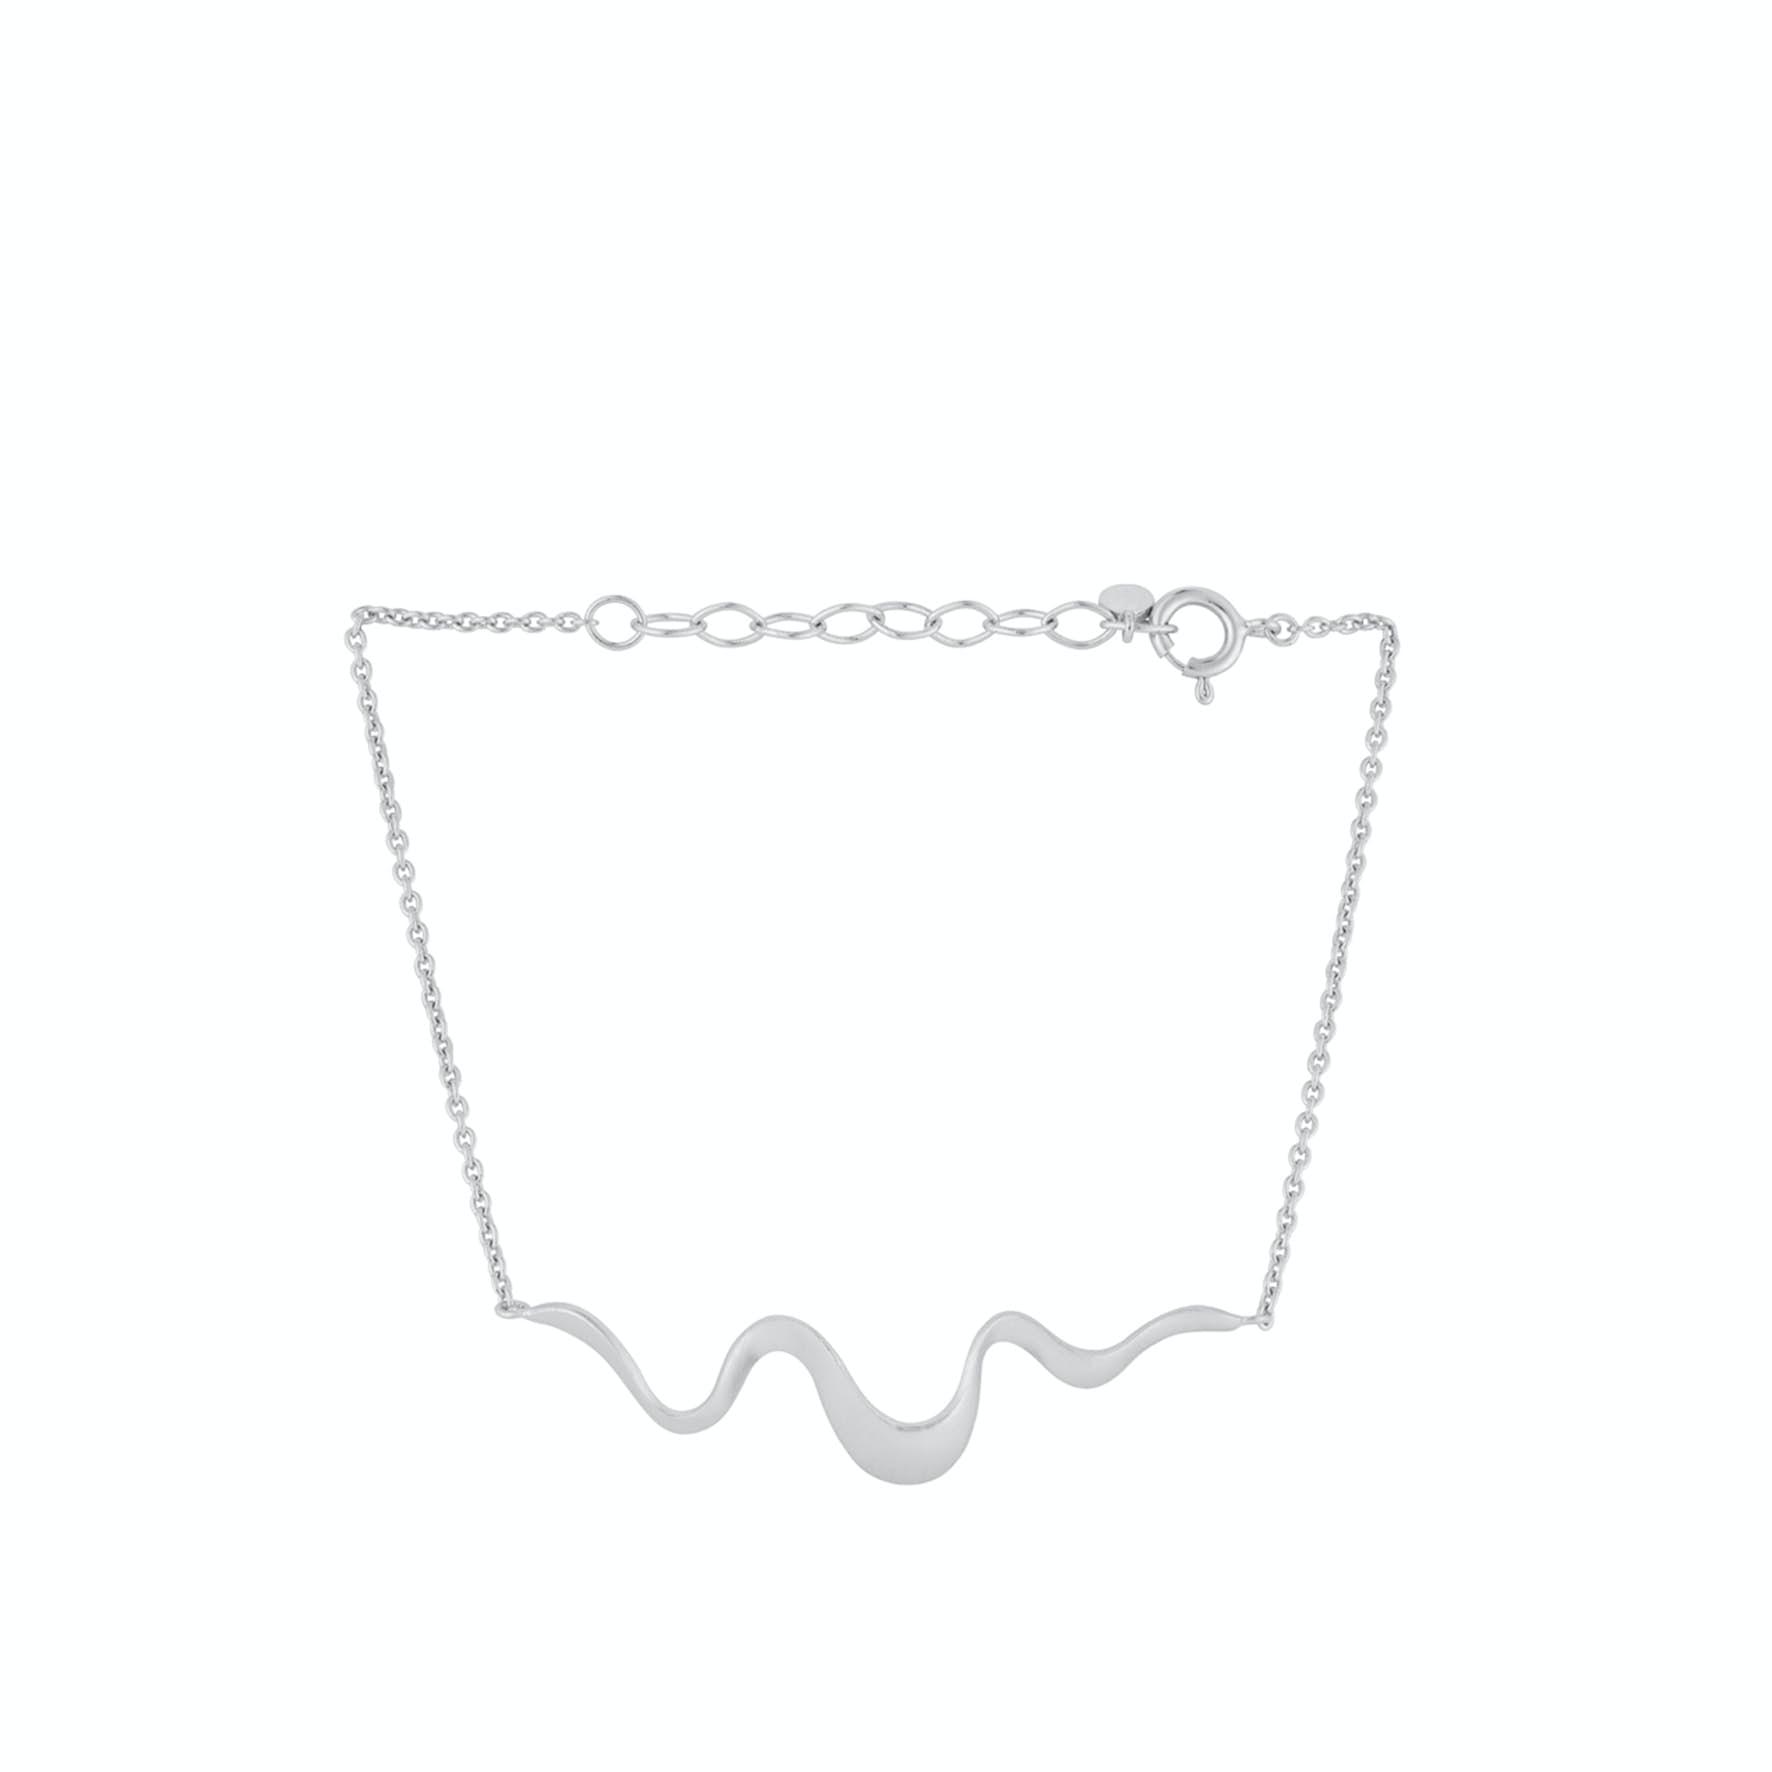 Wave Bracelet von Pernille Corydon in Silber Sterling 925